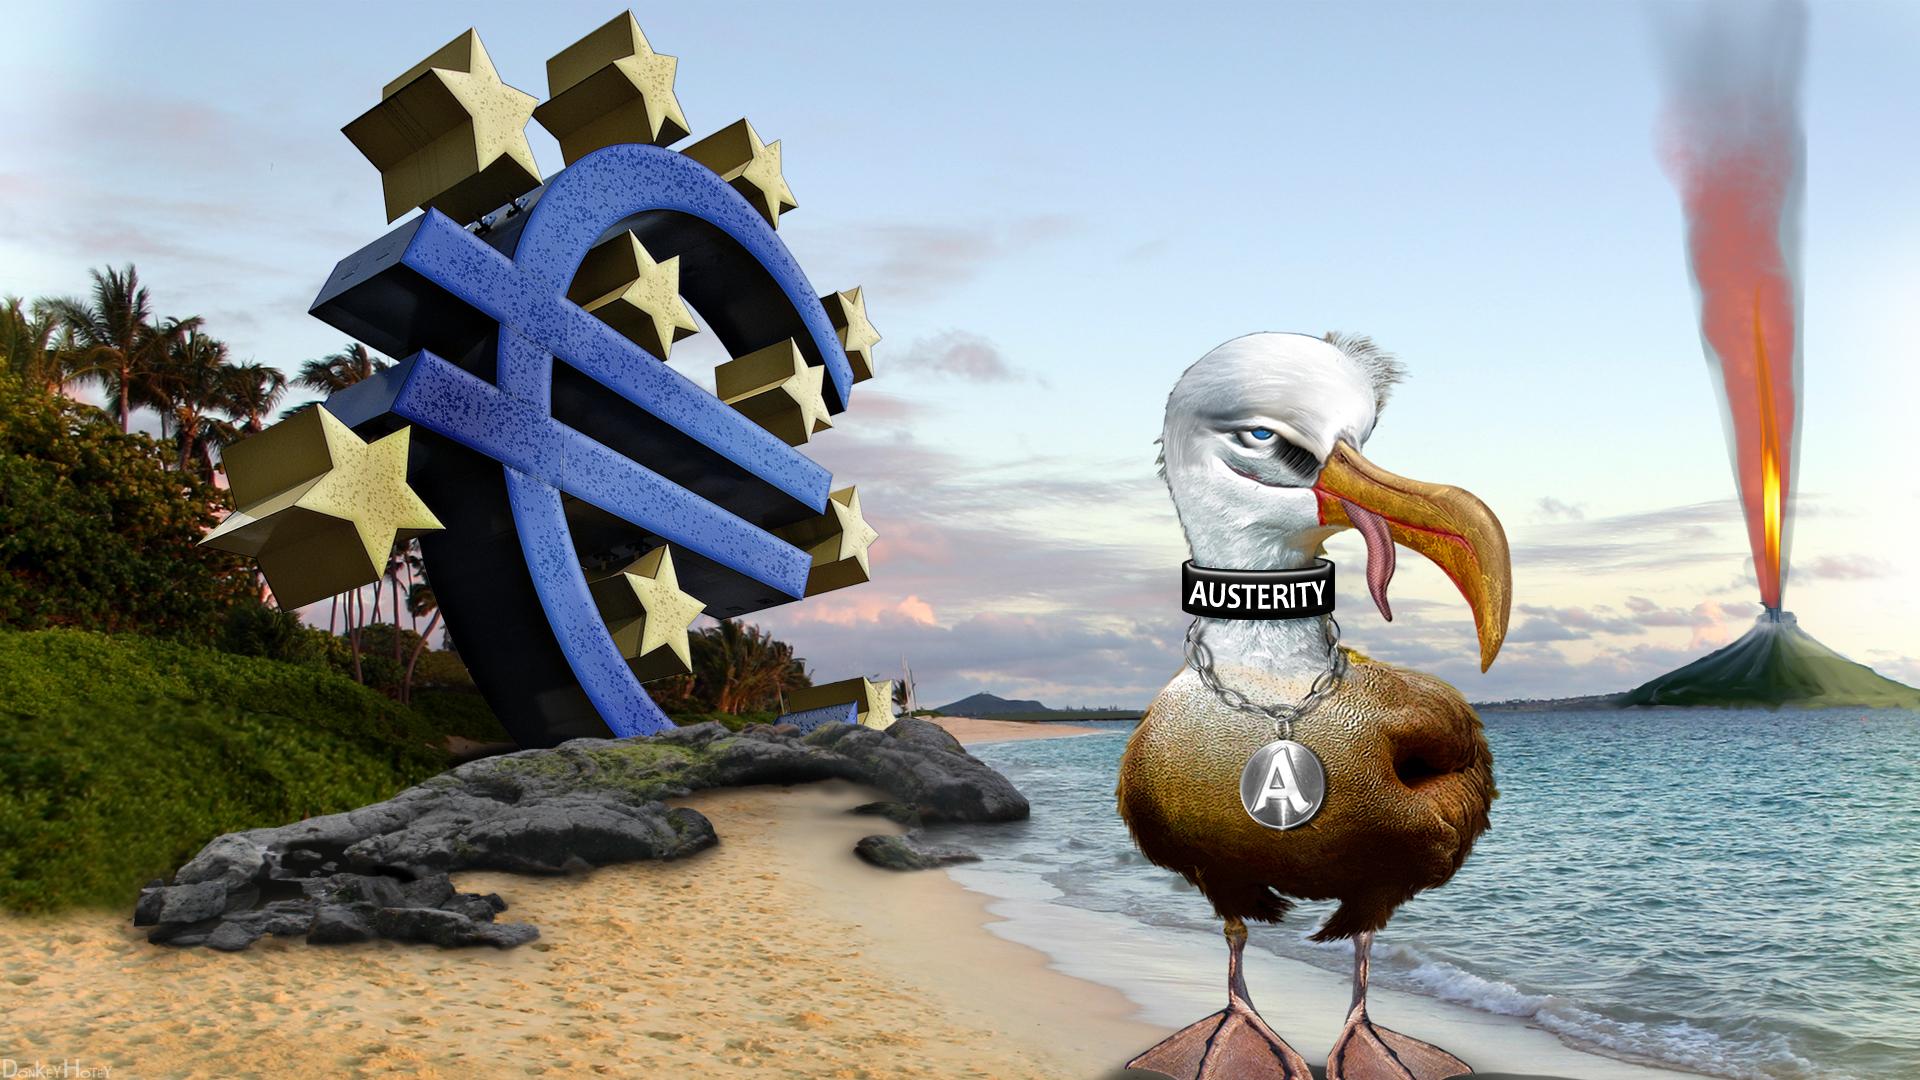 EU_Austerity.jpg